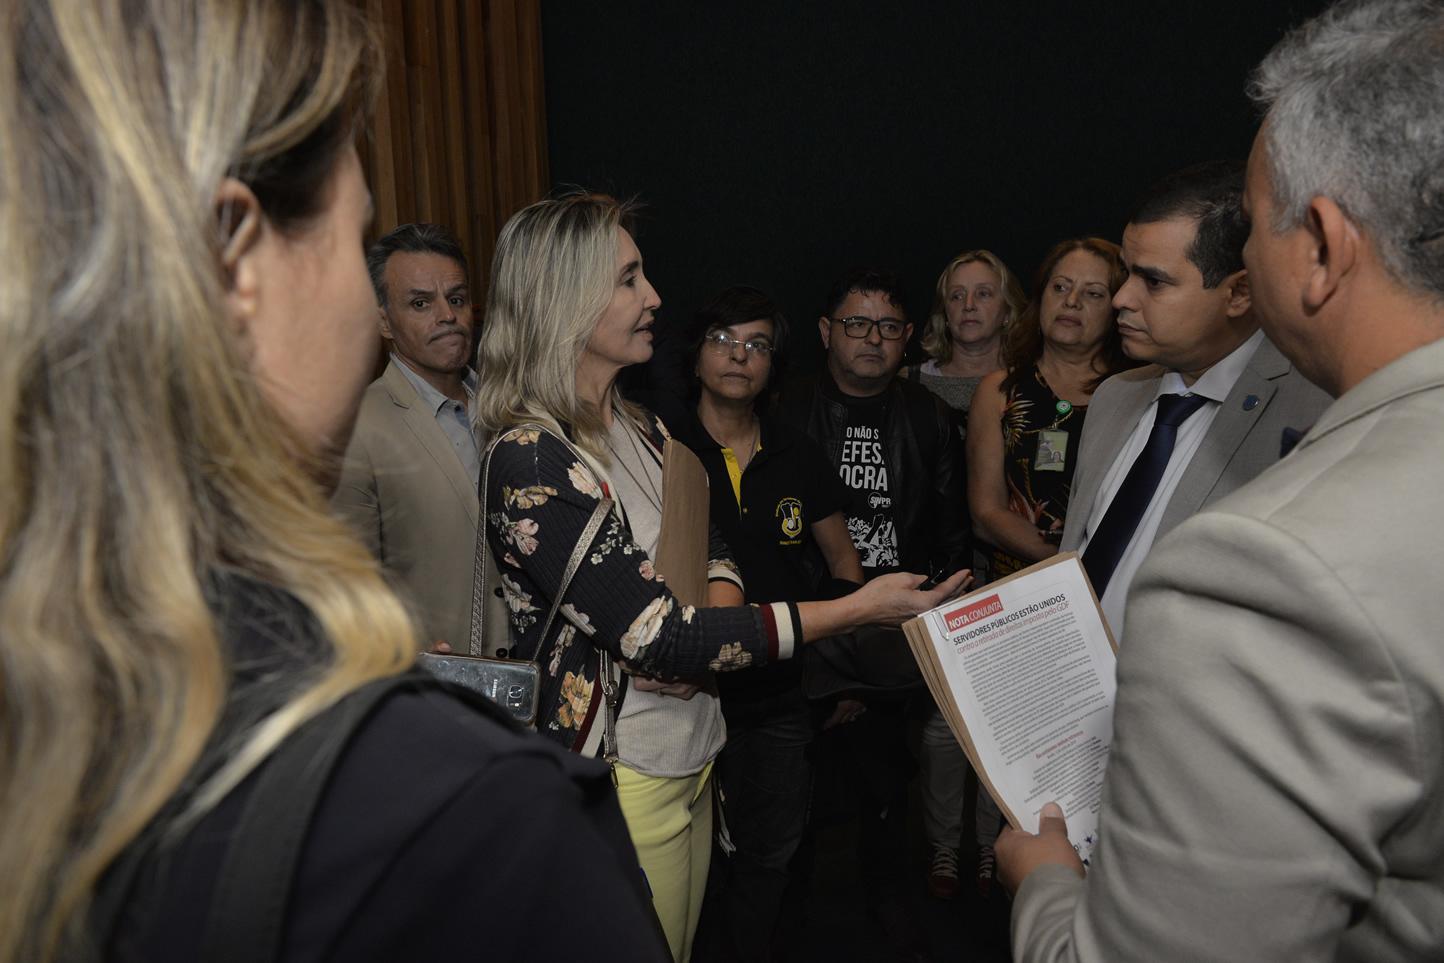 2019.06.13_Visita-aos-gabinetes-contra-o-fim-da-licenca-premio_fotos-Deva-Garcia-40